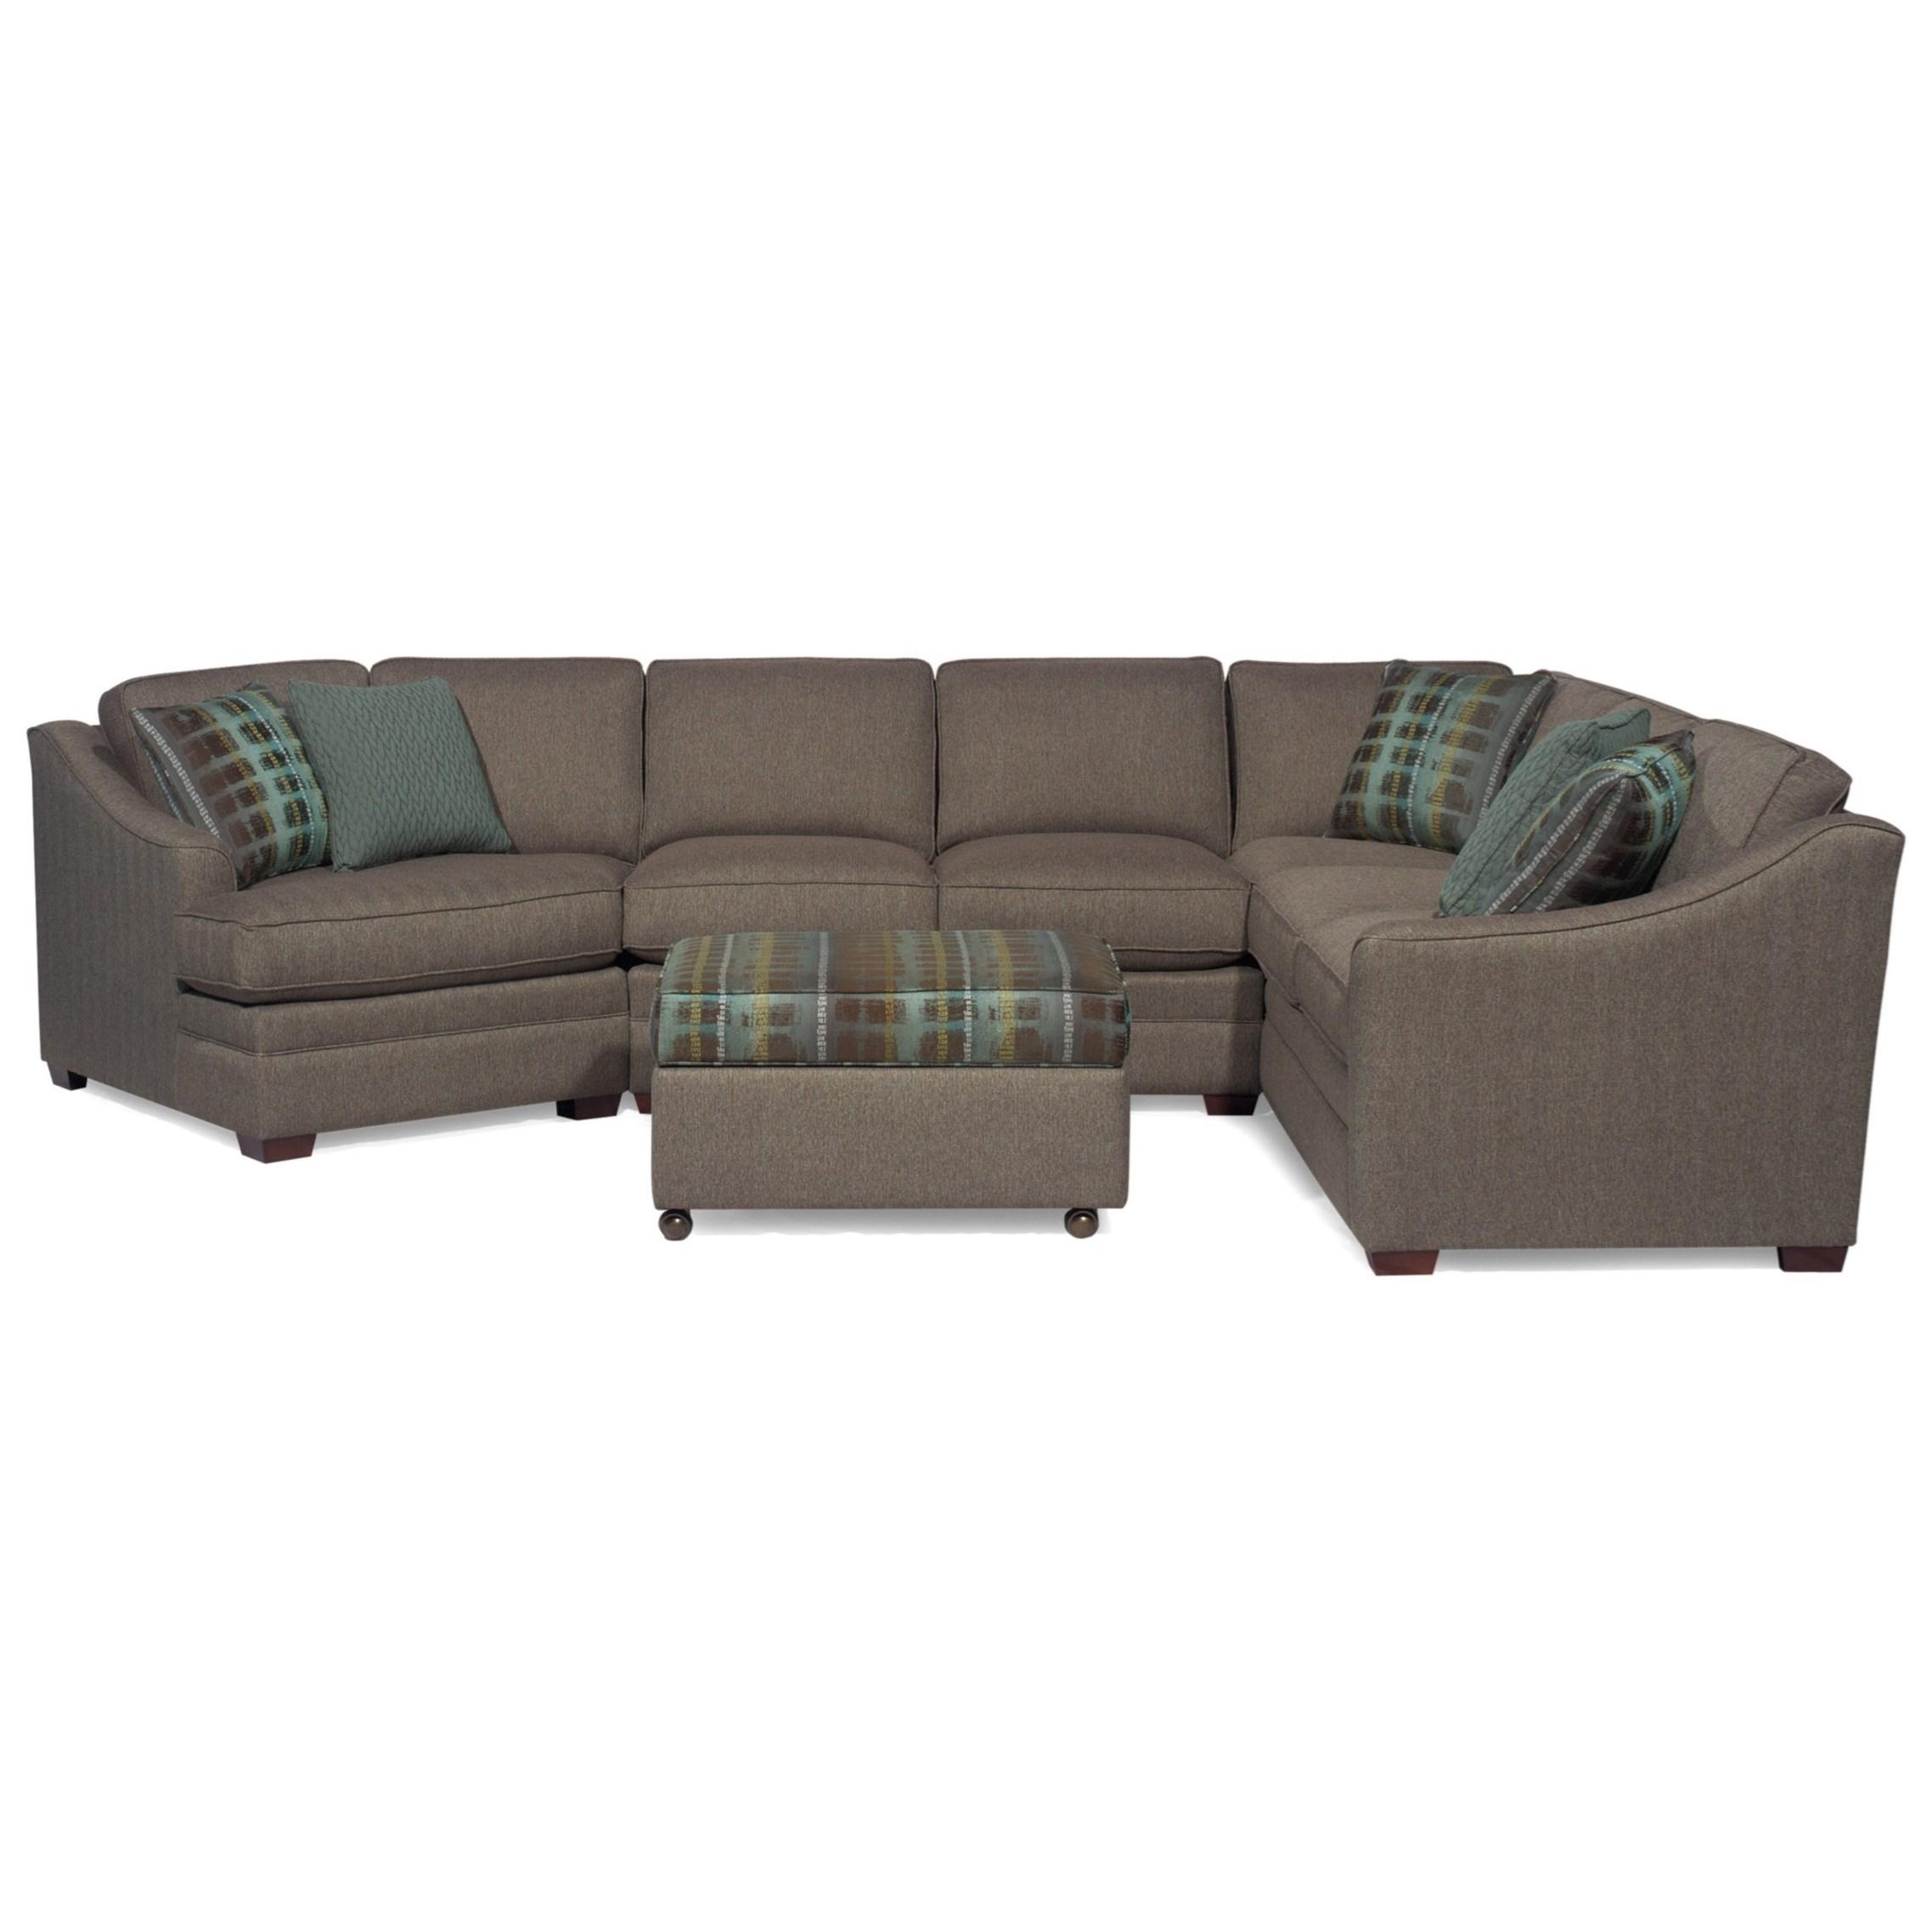 Superb Hickorycraft F9 Custom Collection Bcustomizable B 3 Machost Co Dining Chair Design Ideas Machostcouk